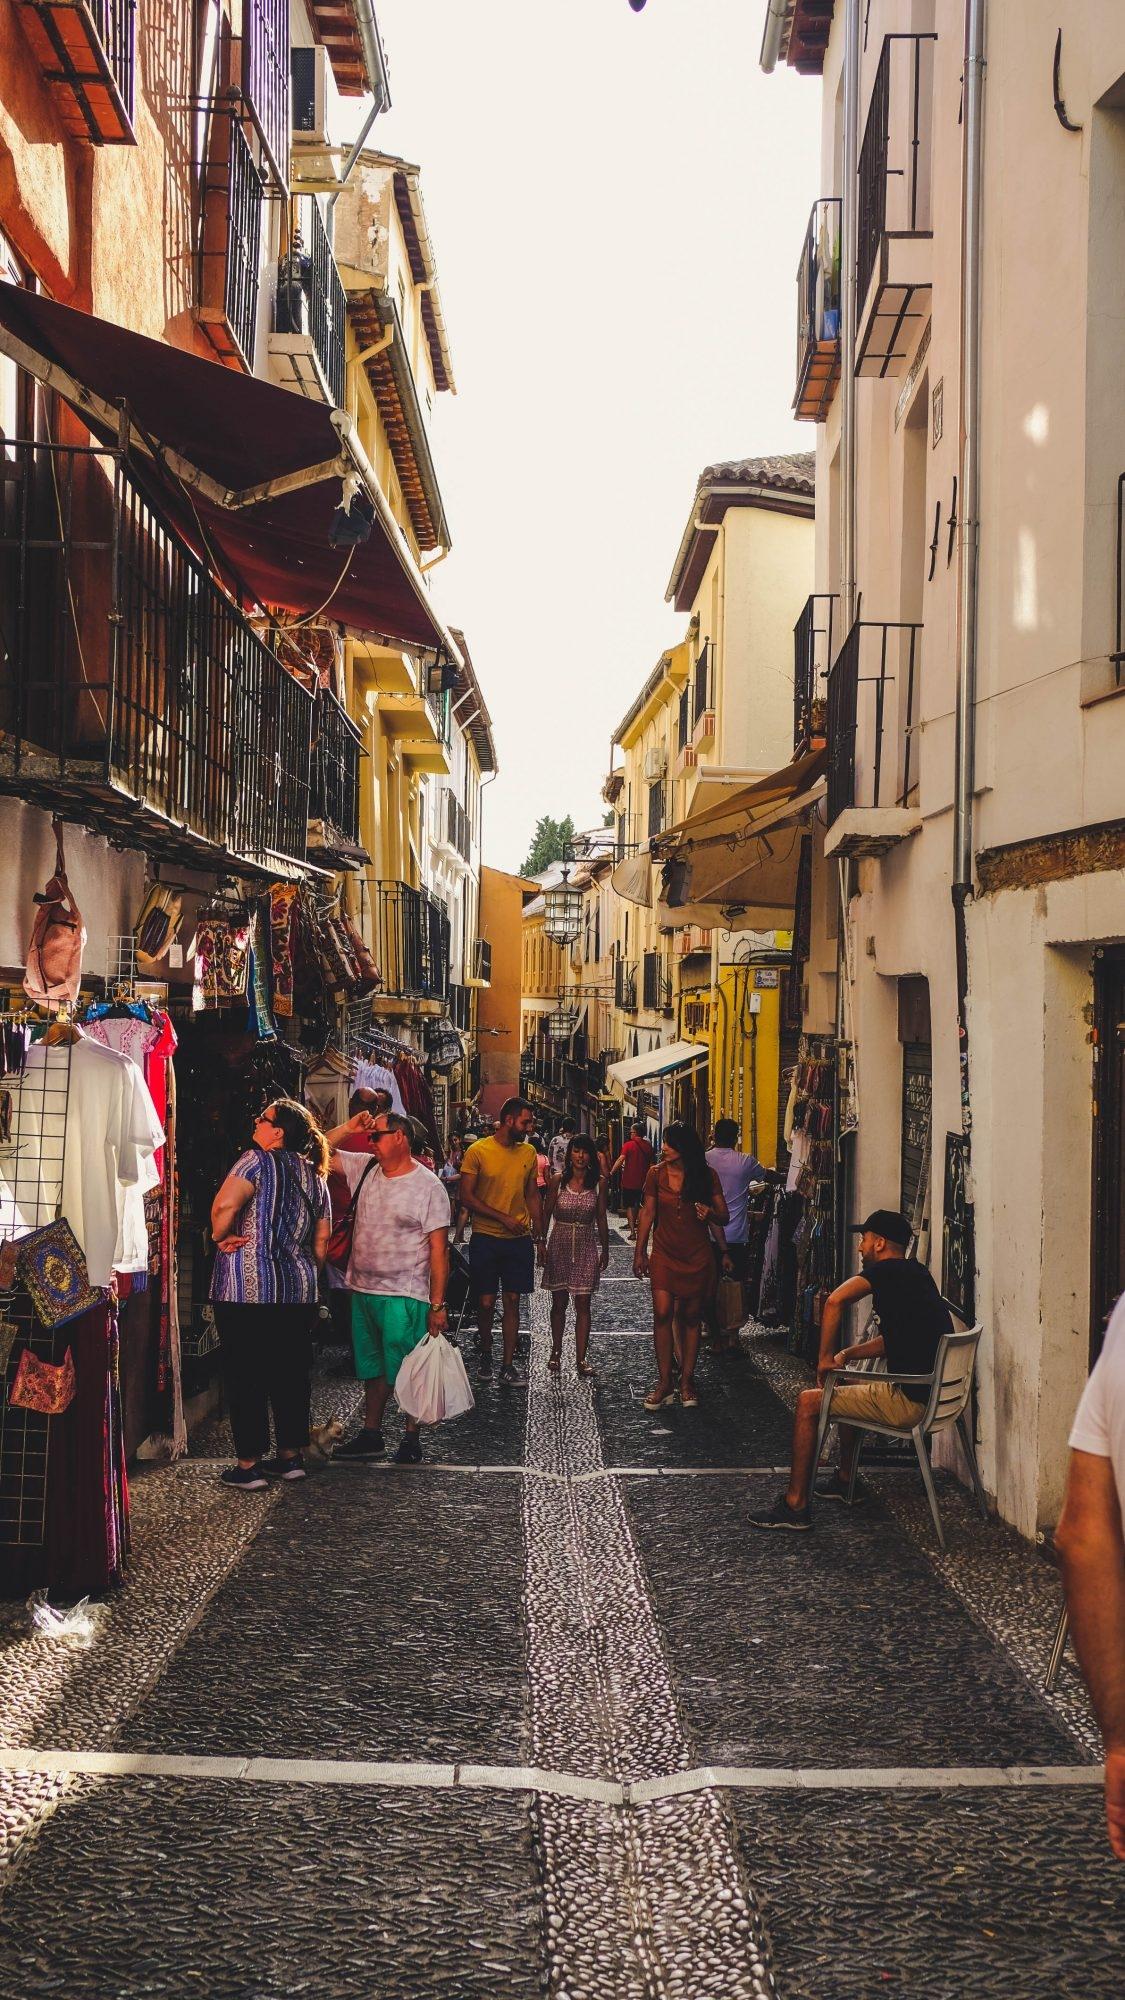 Grenade - Rue commerçante dans l'Albacin